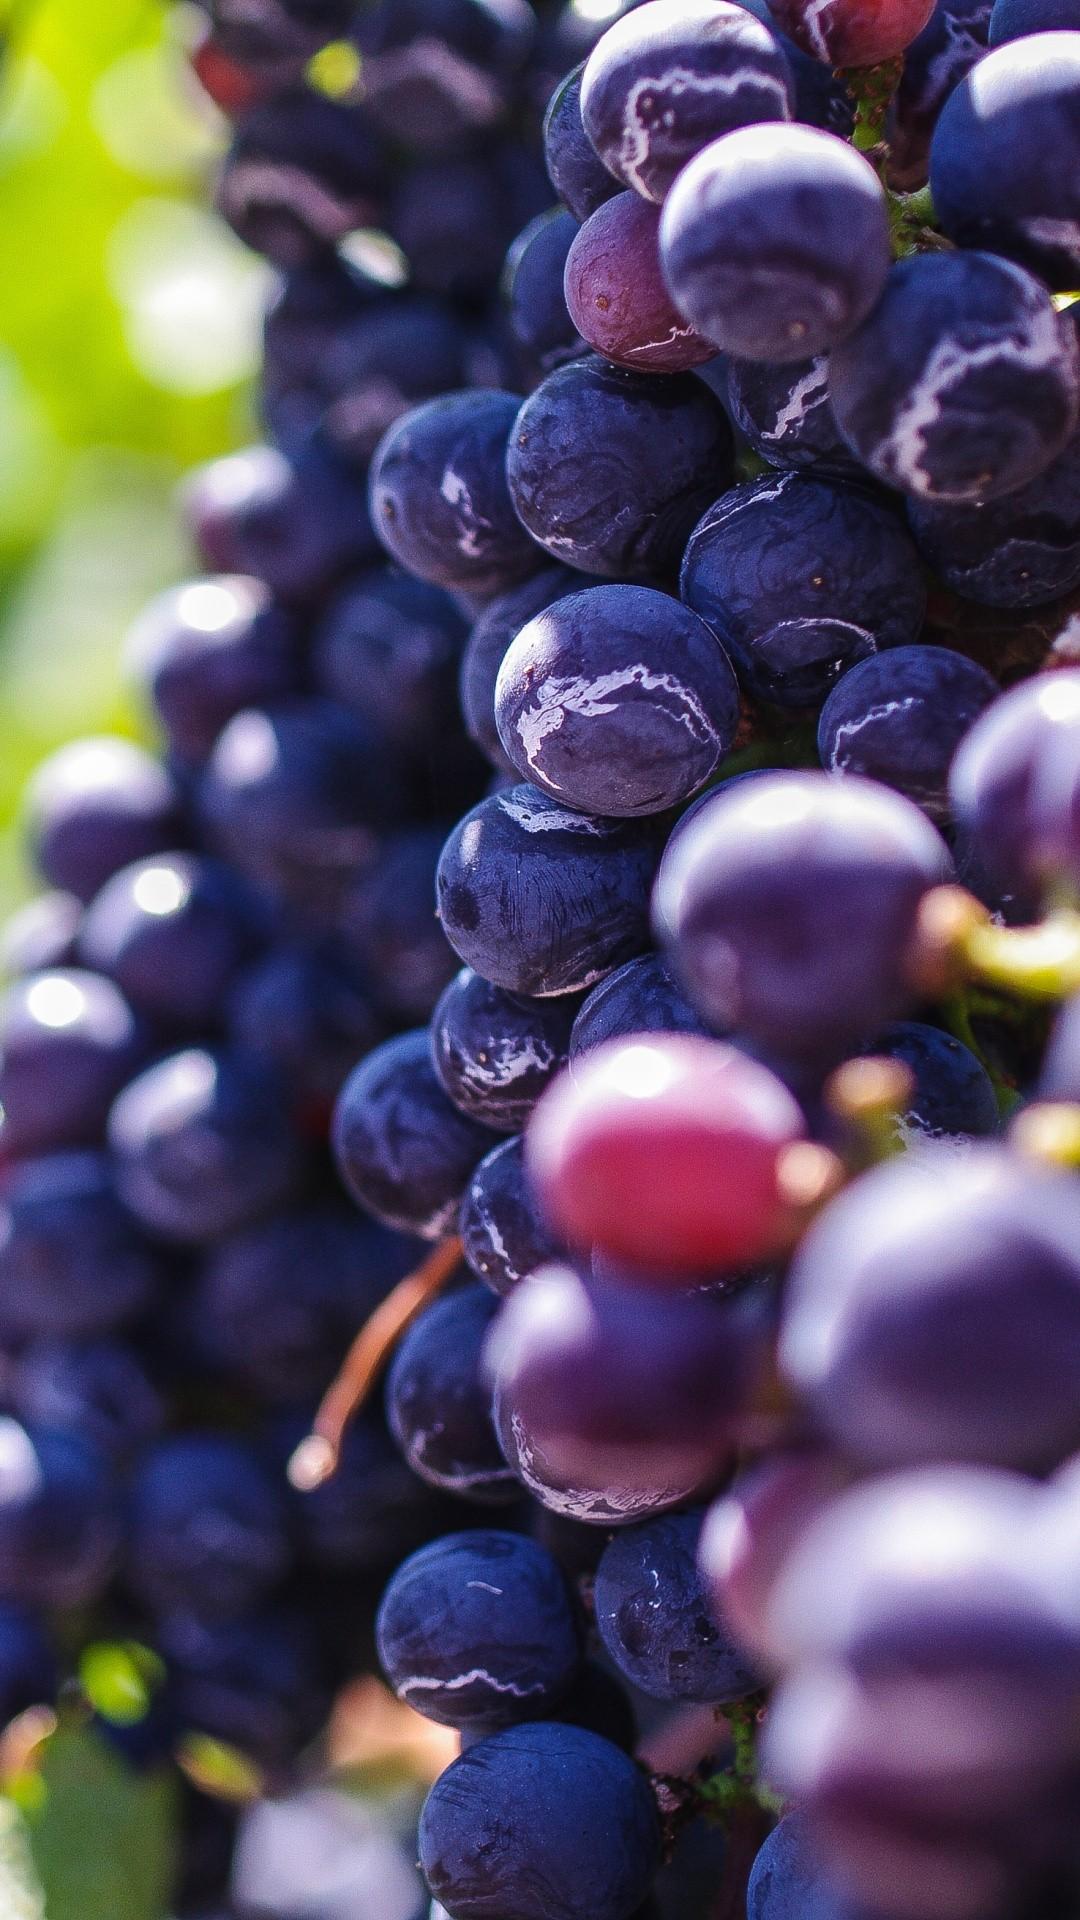 Vineyard Vines iPhone 6 wallpaper